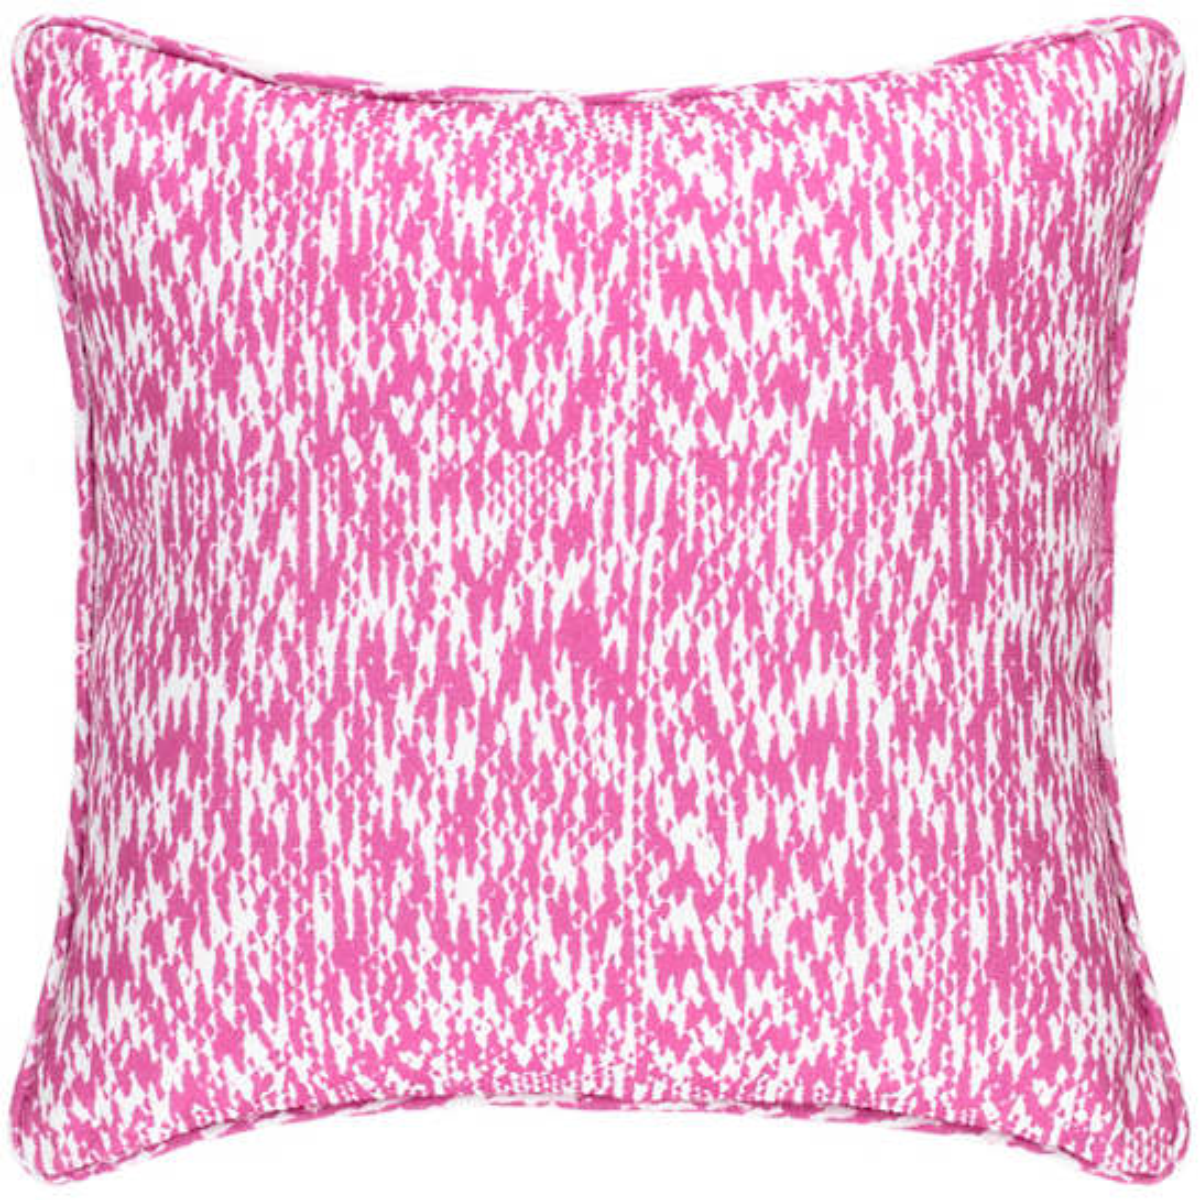 Sea Island Fuchsia Indoor/Outdoor Decorative Pillow